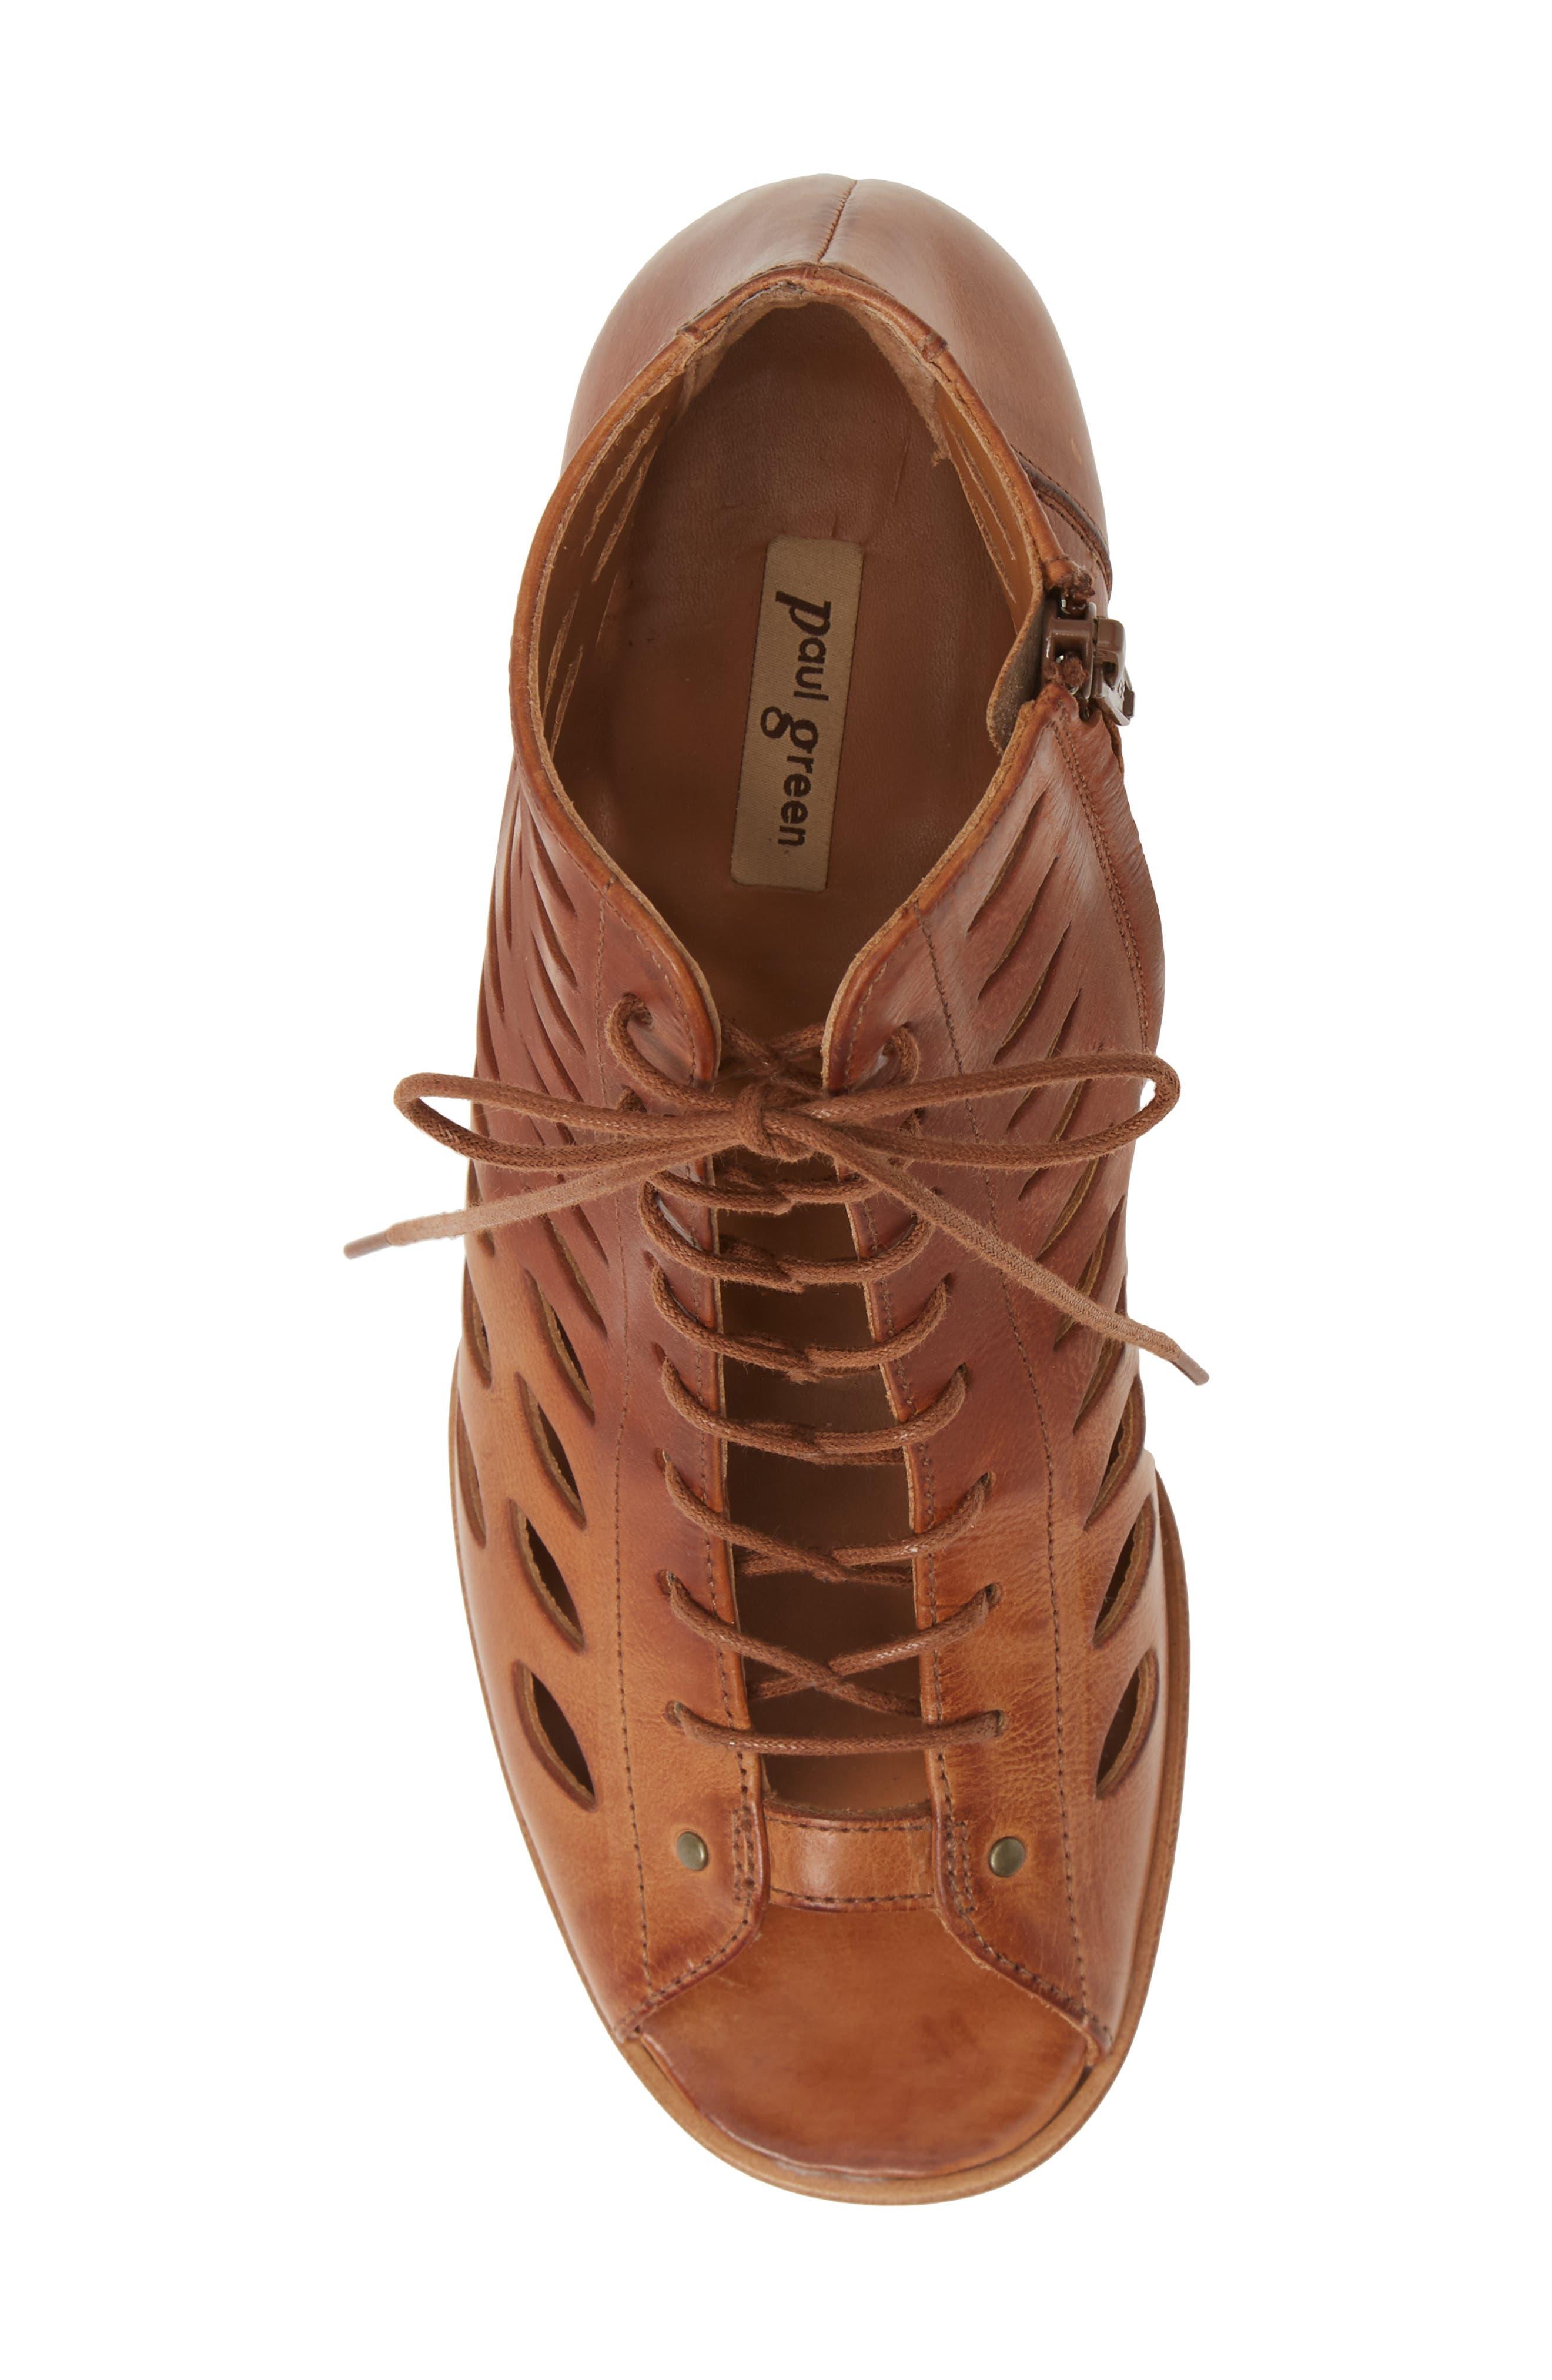 Paul Green   Bali Lace-Up Bootie Sandal